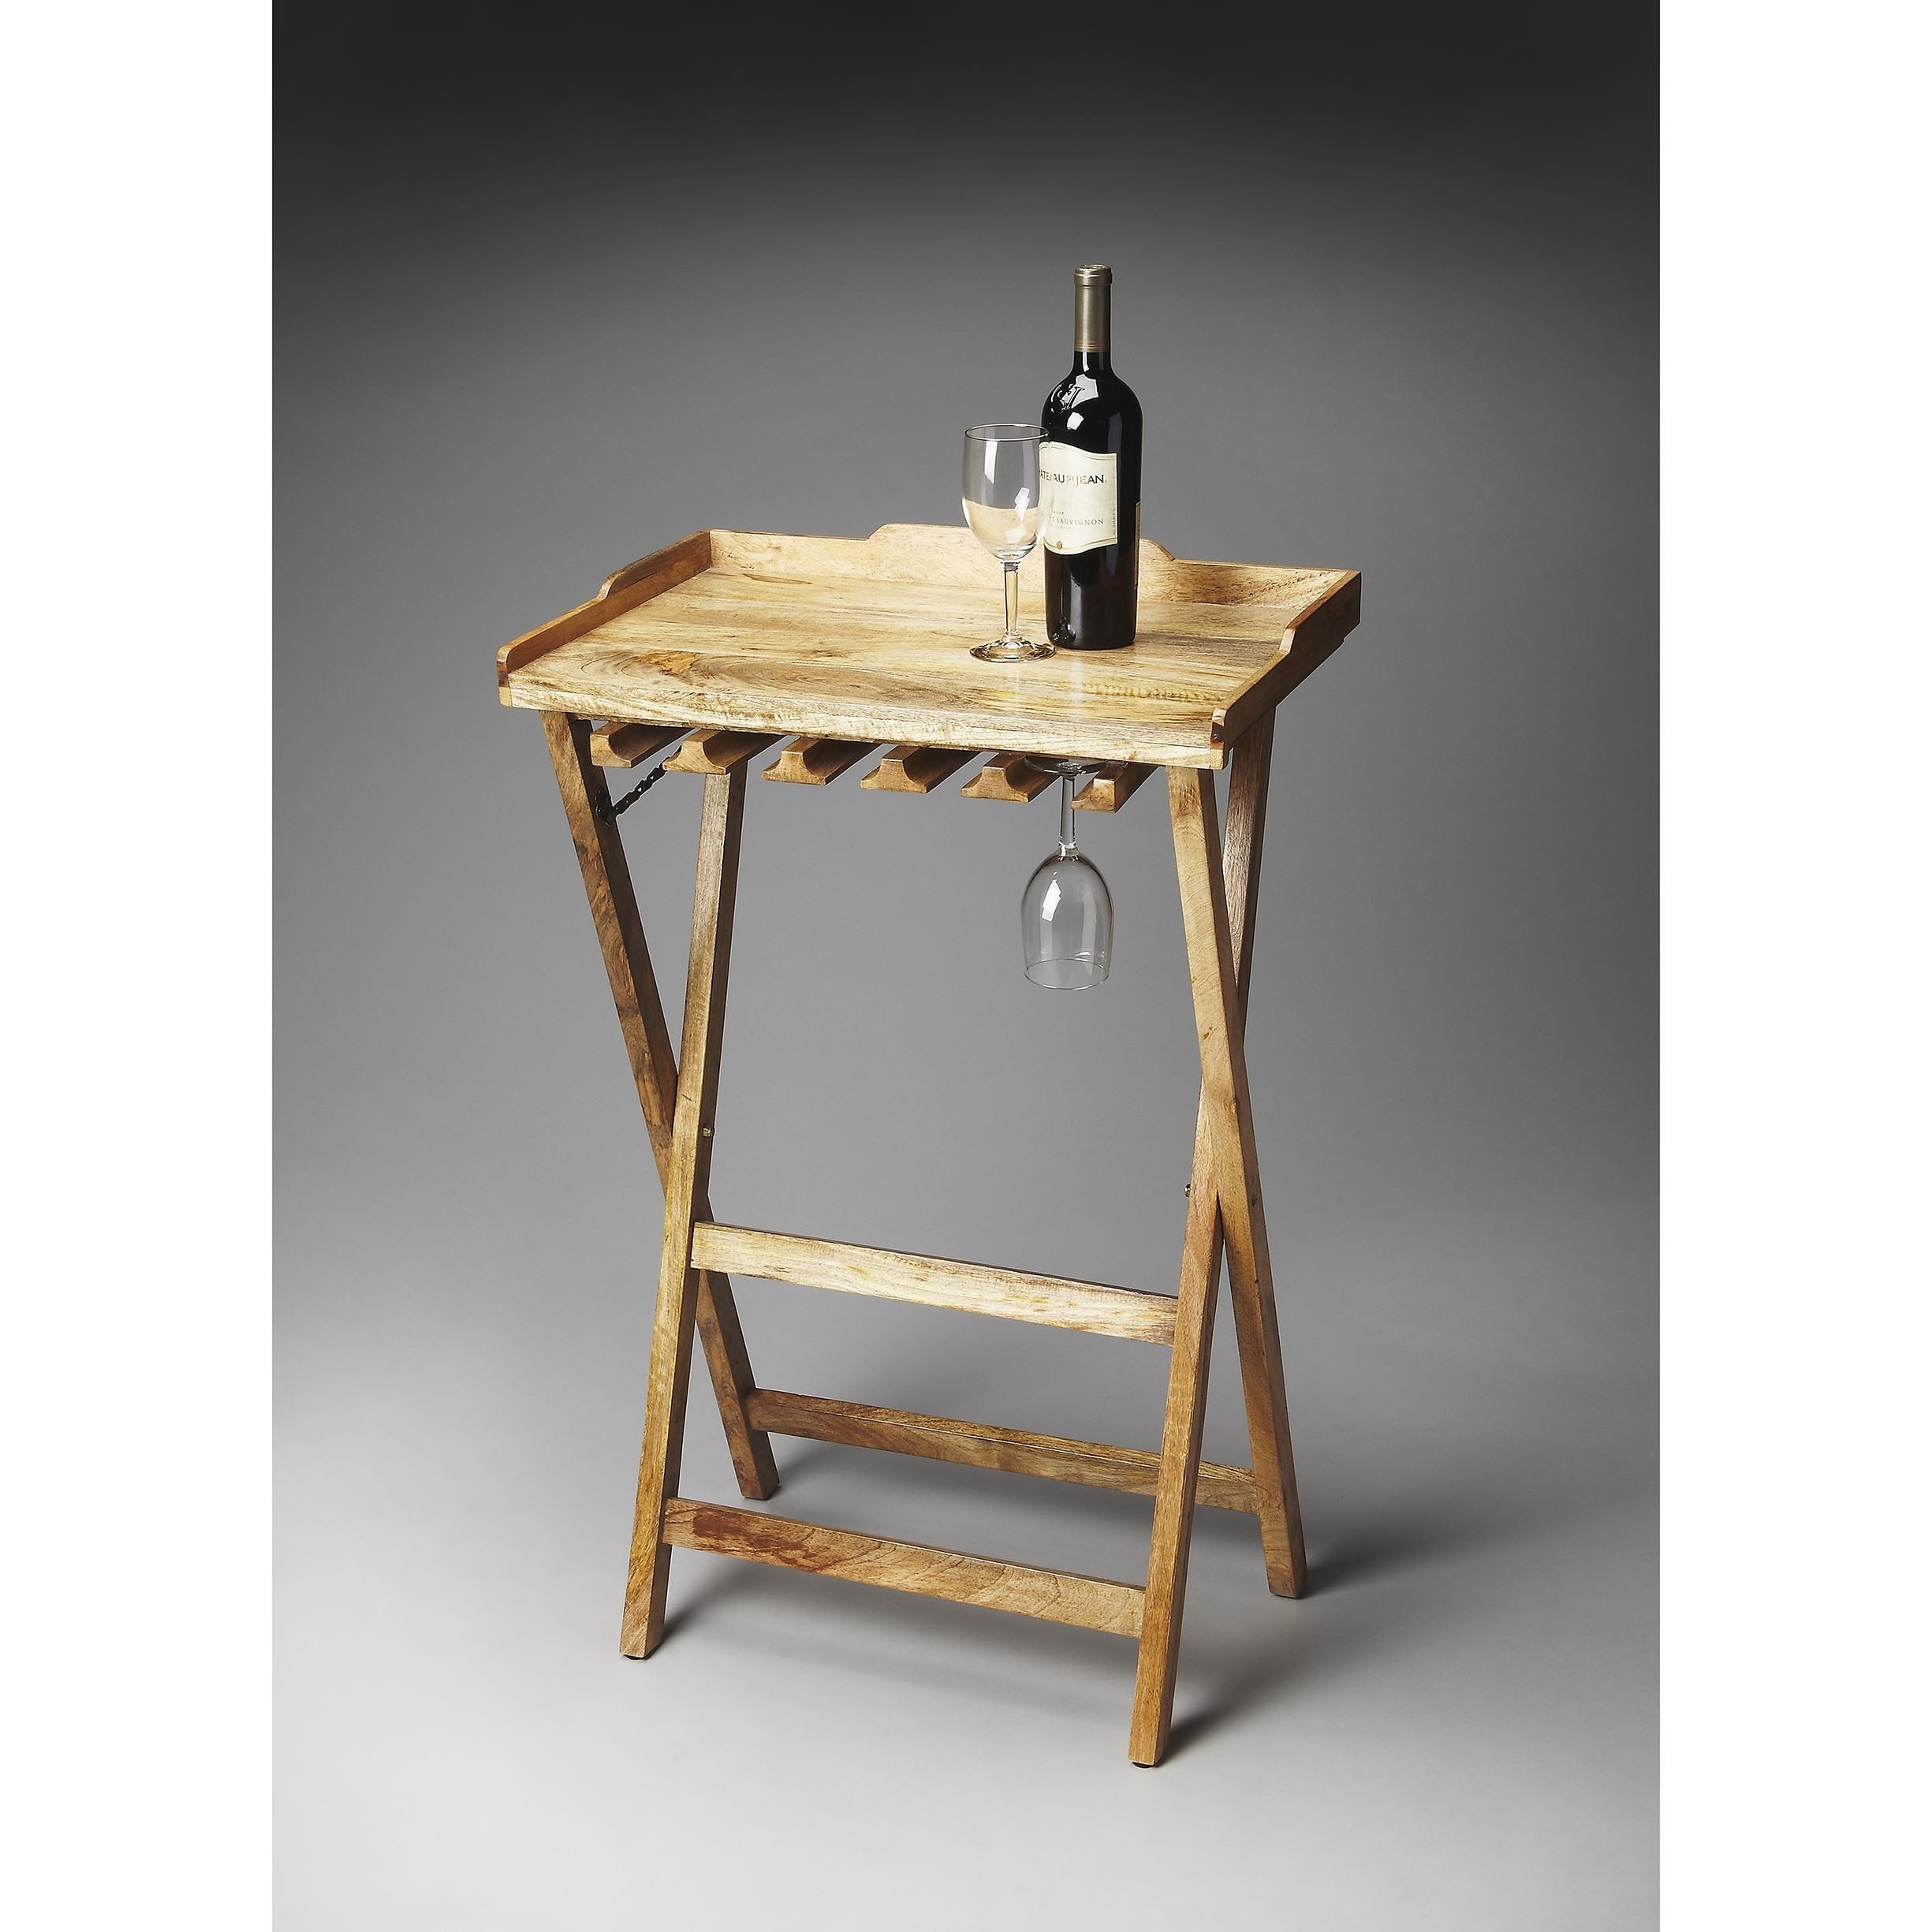 Butler Highland Solid Wood Folding Wine Rack (Natural Woo...